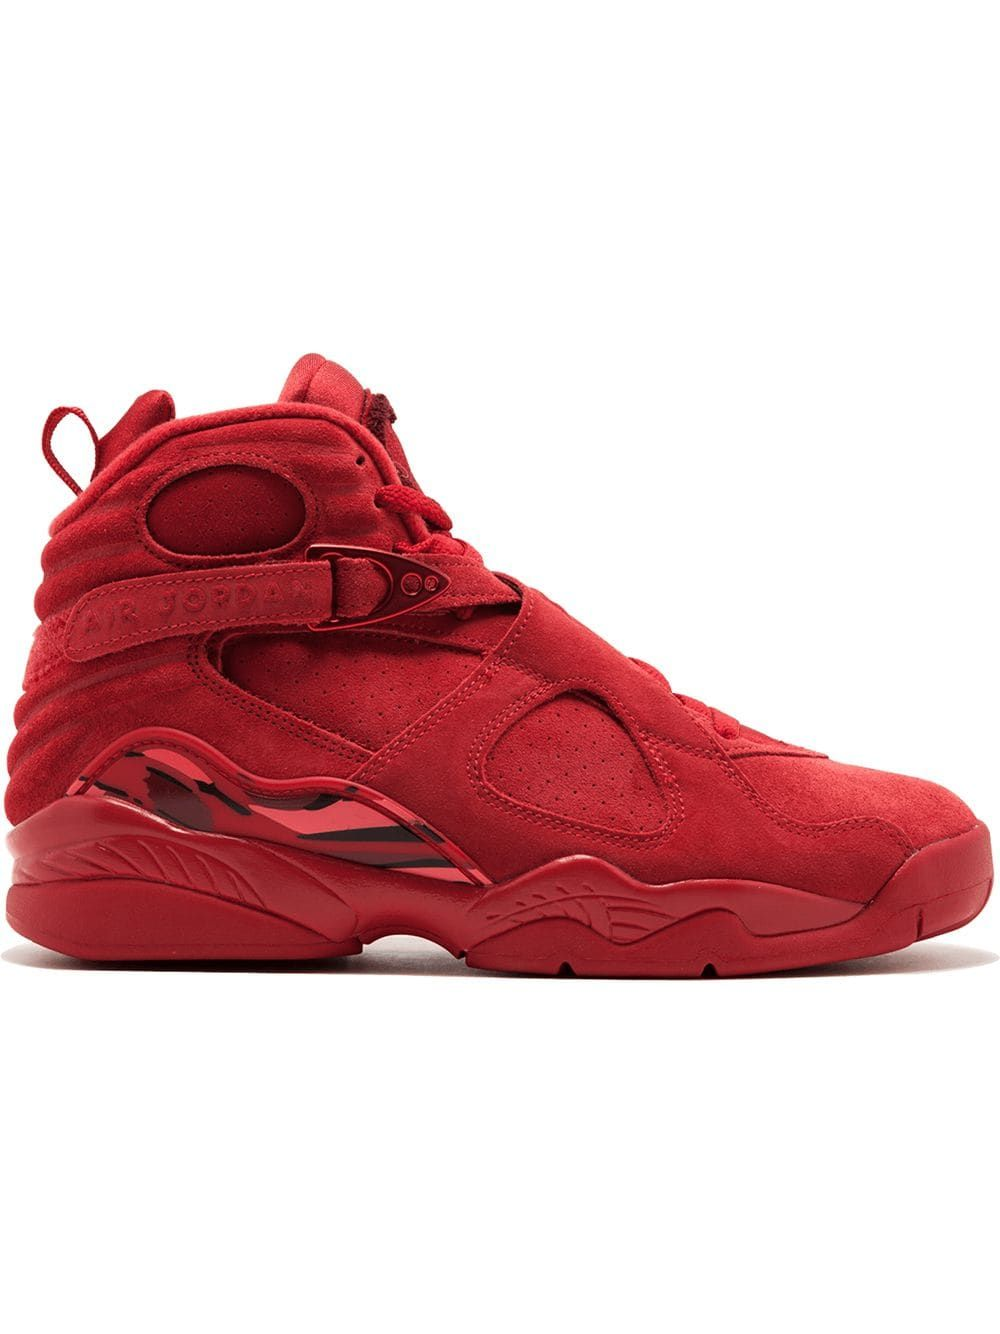 Jordan Air Jordan 8 Retro Valentine's